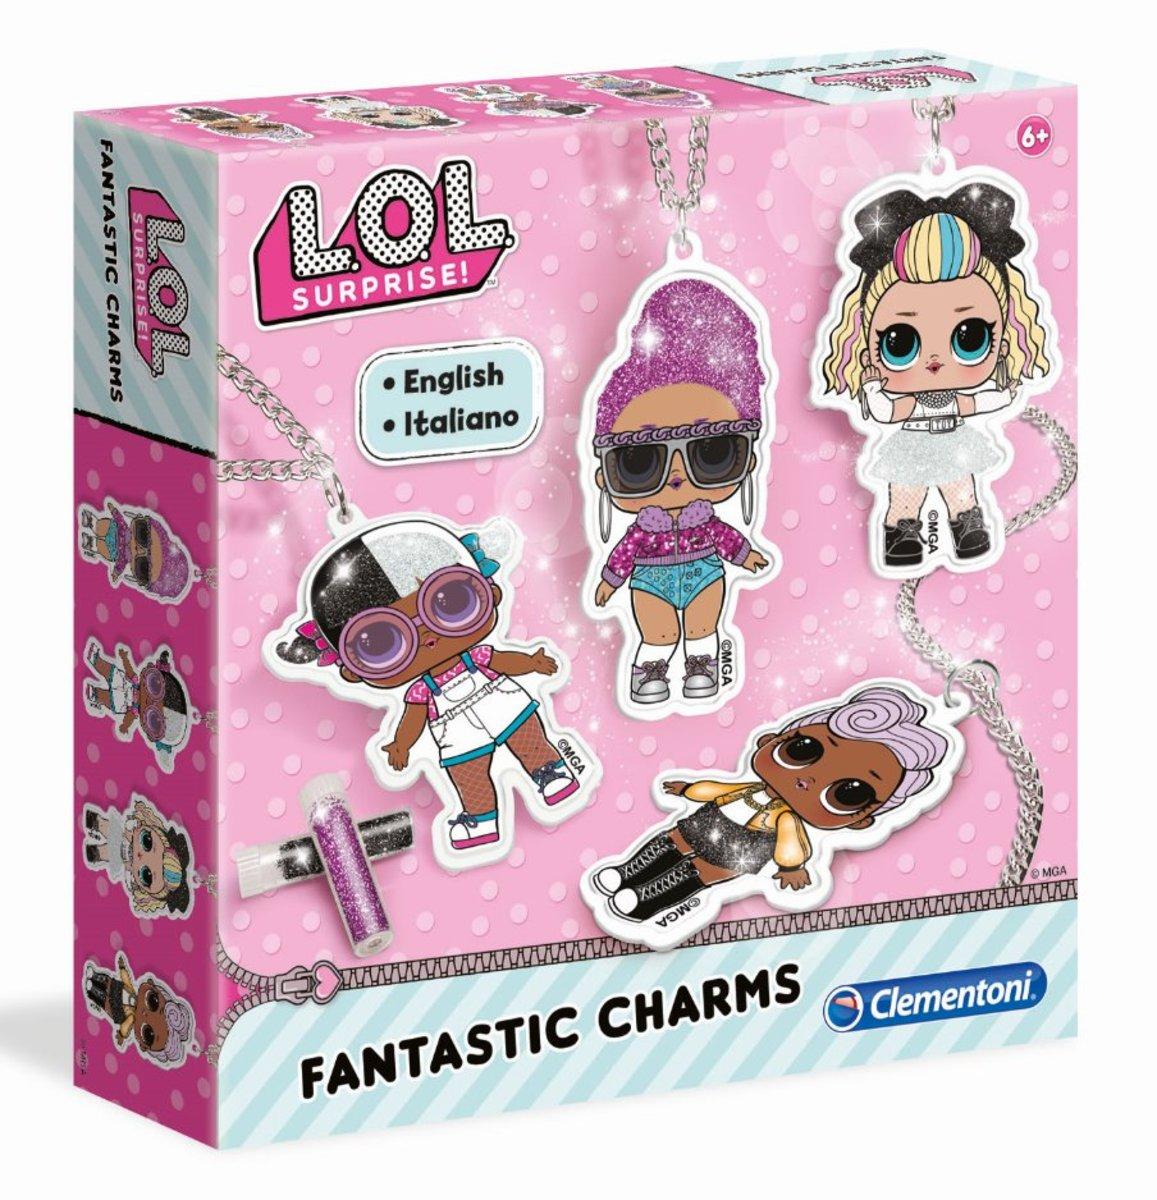 L.O.L. Fantastic Charms